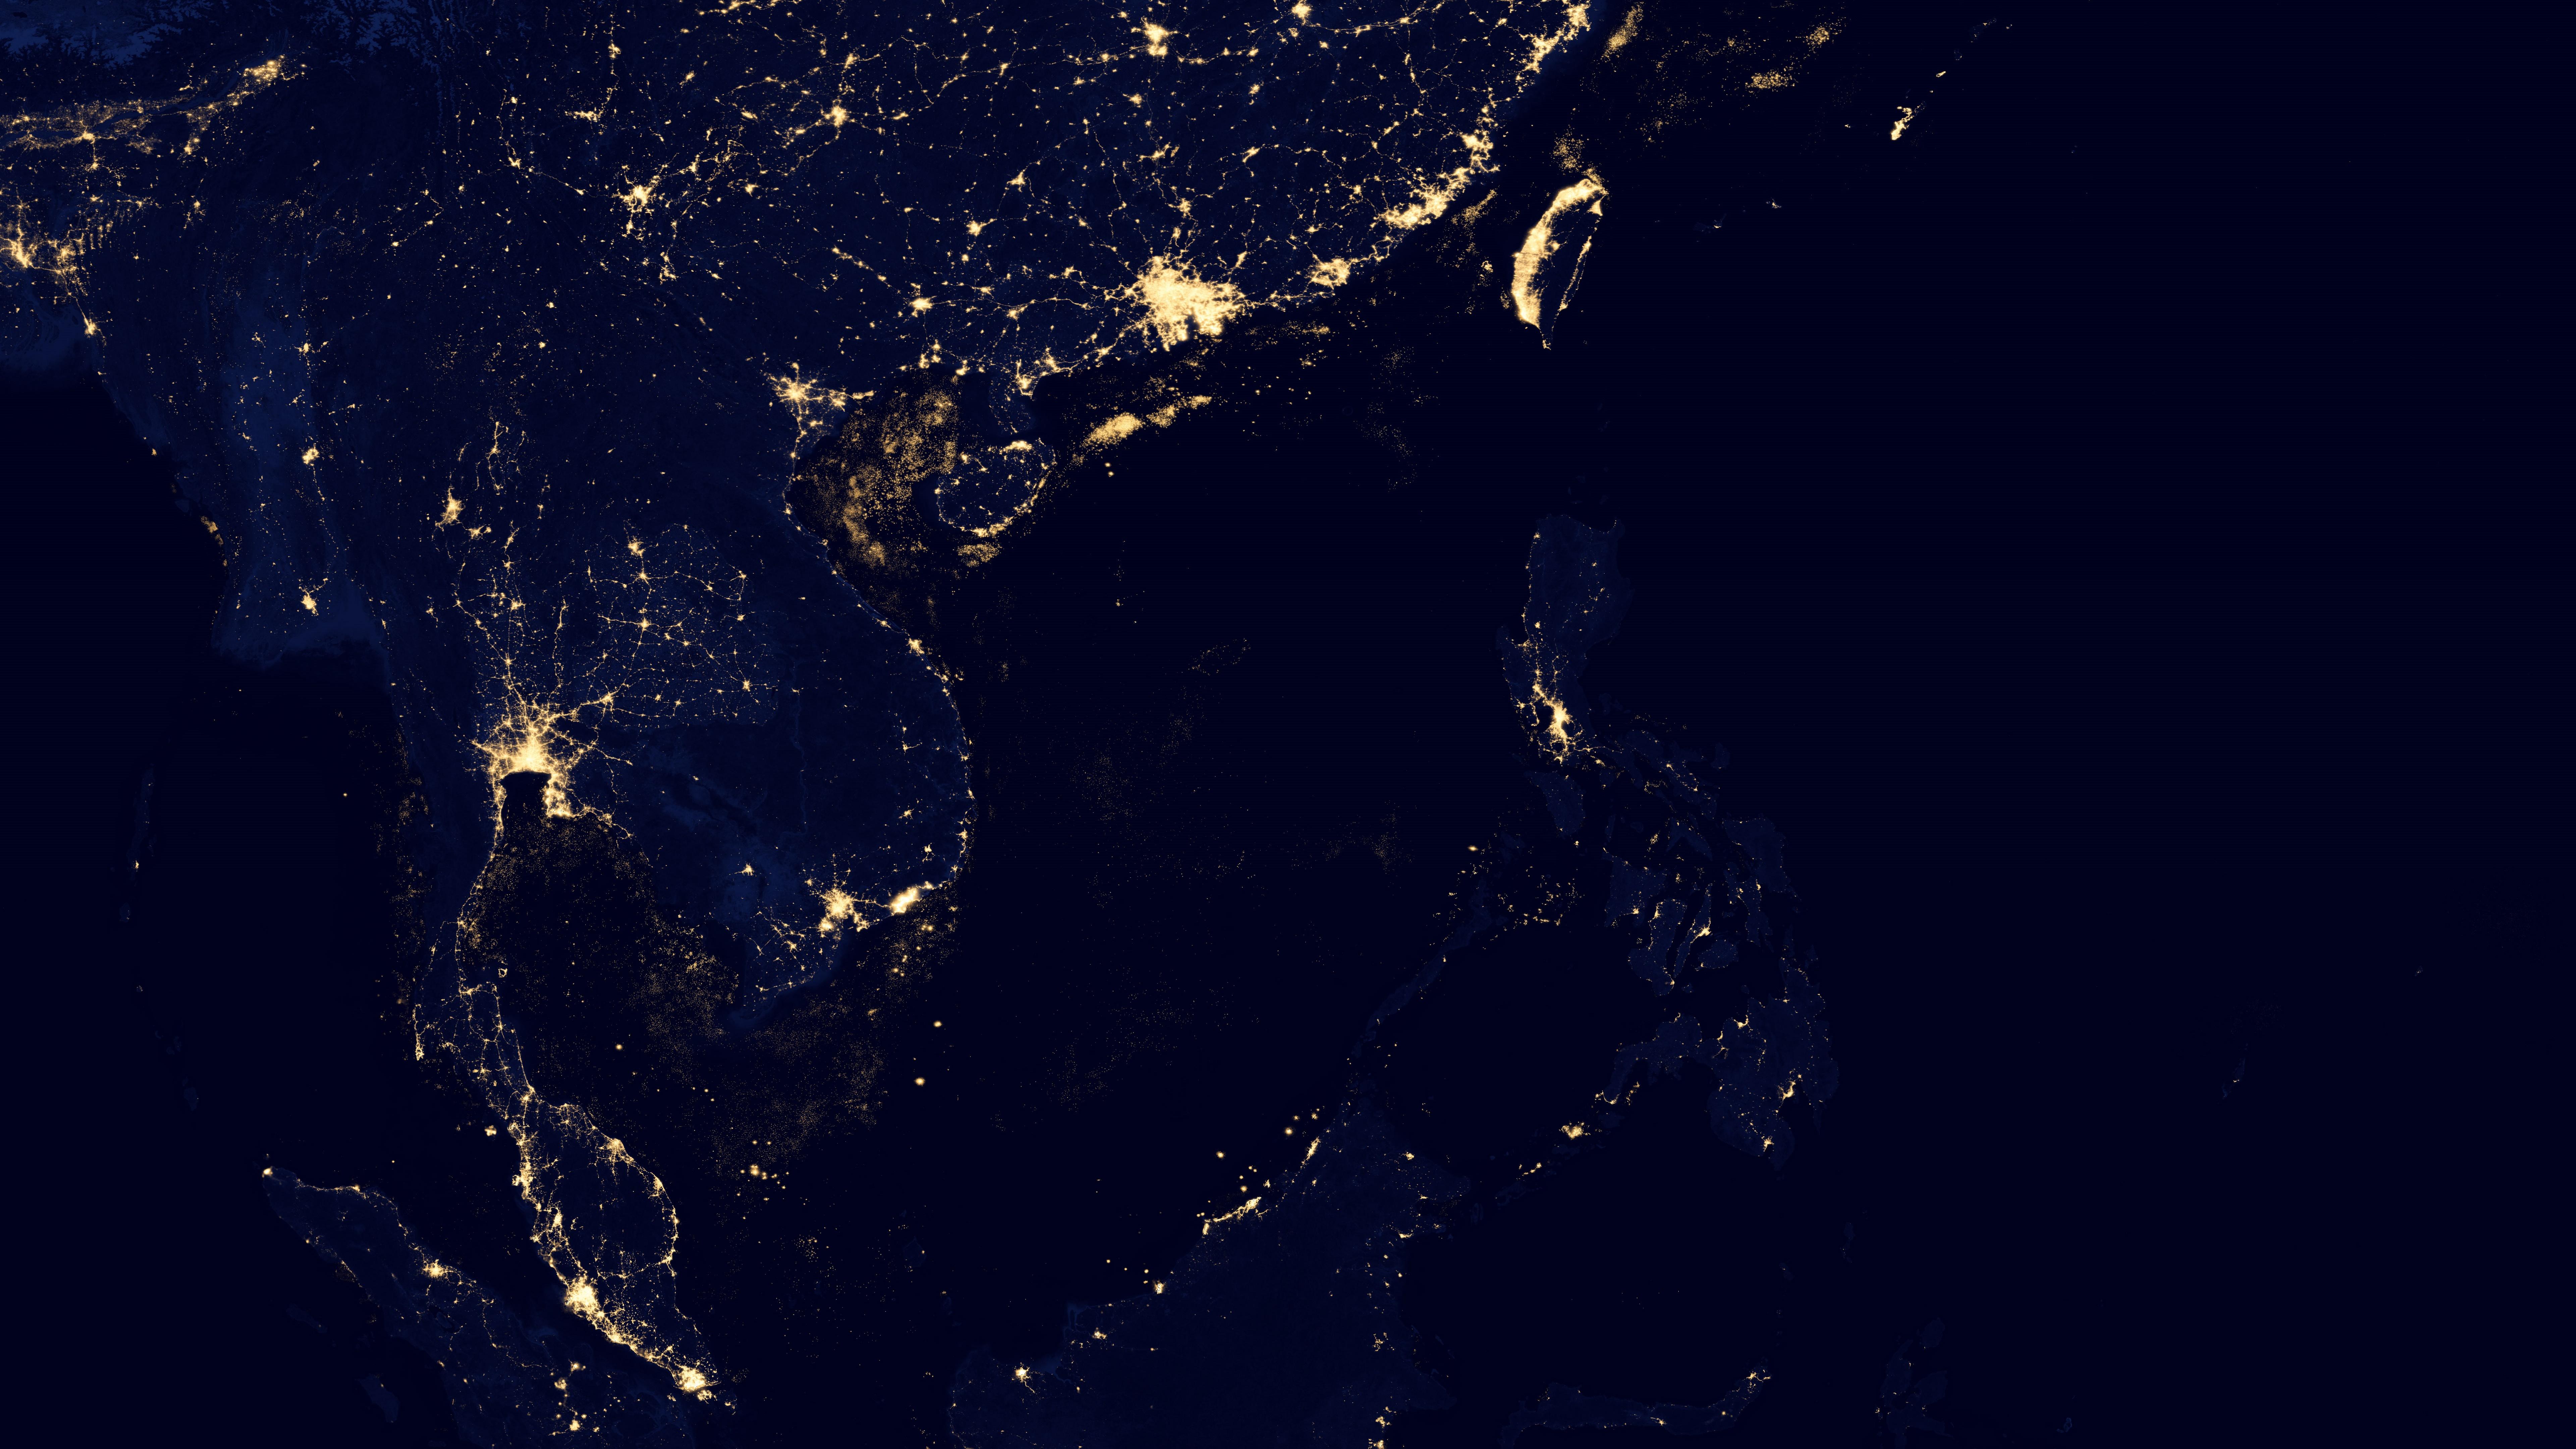 Night Lights in Southeast Asia v2012 wallpaper